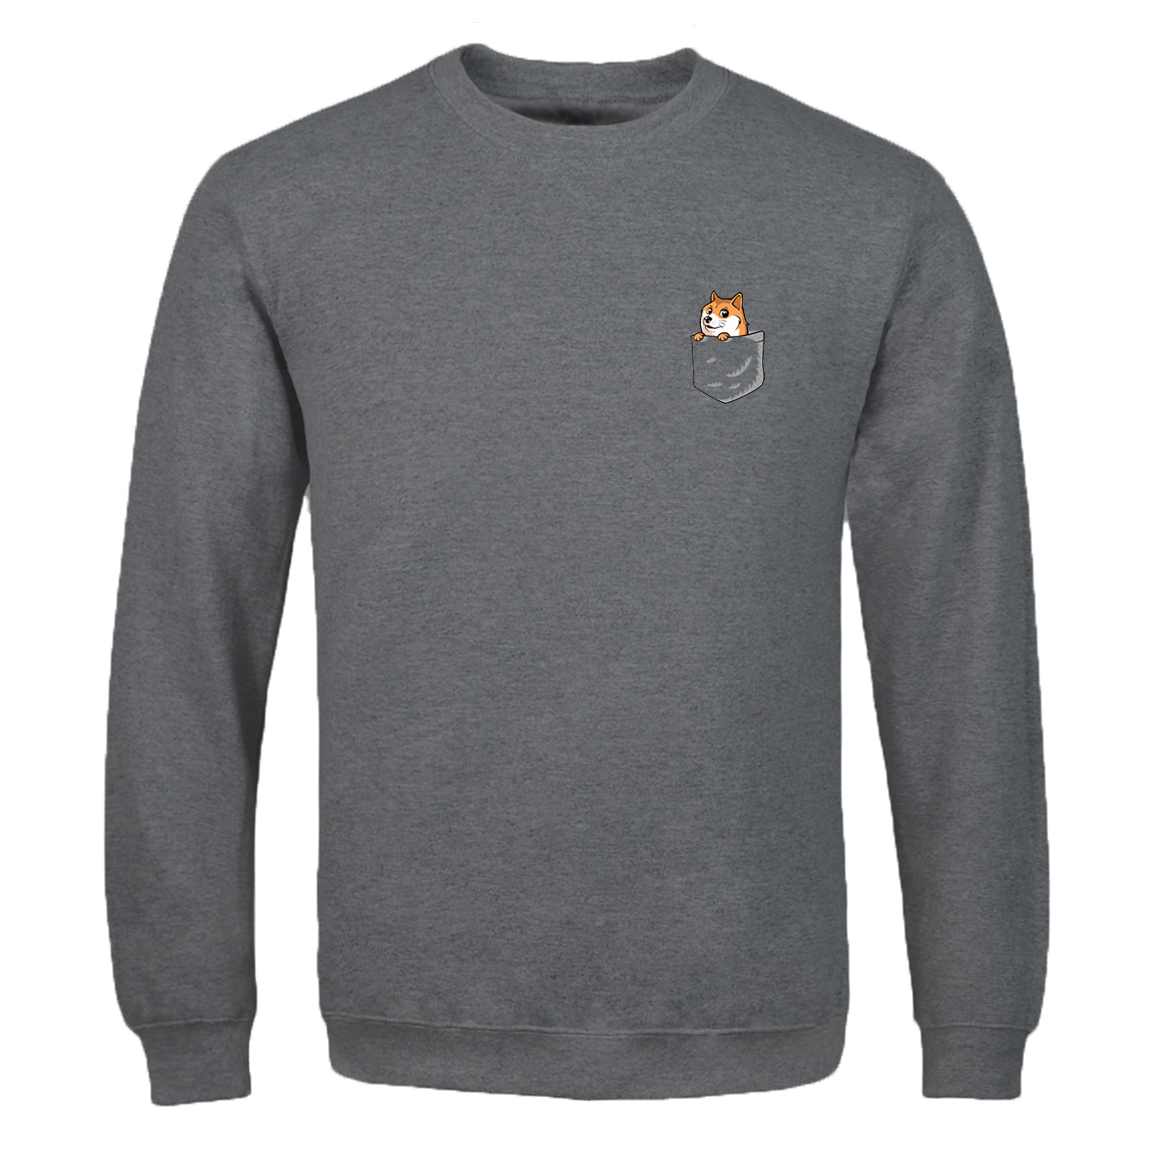 Spring Autumn Trend Pocket Dog Print Clothings Men Casual Brand Man Fleece Casual Pullovers Clothing Sweatshirt 2020 Sportswear